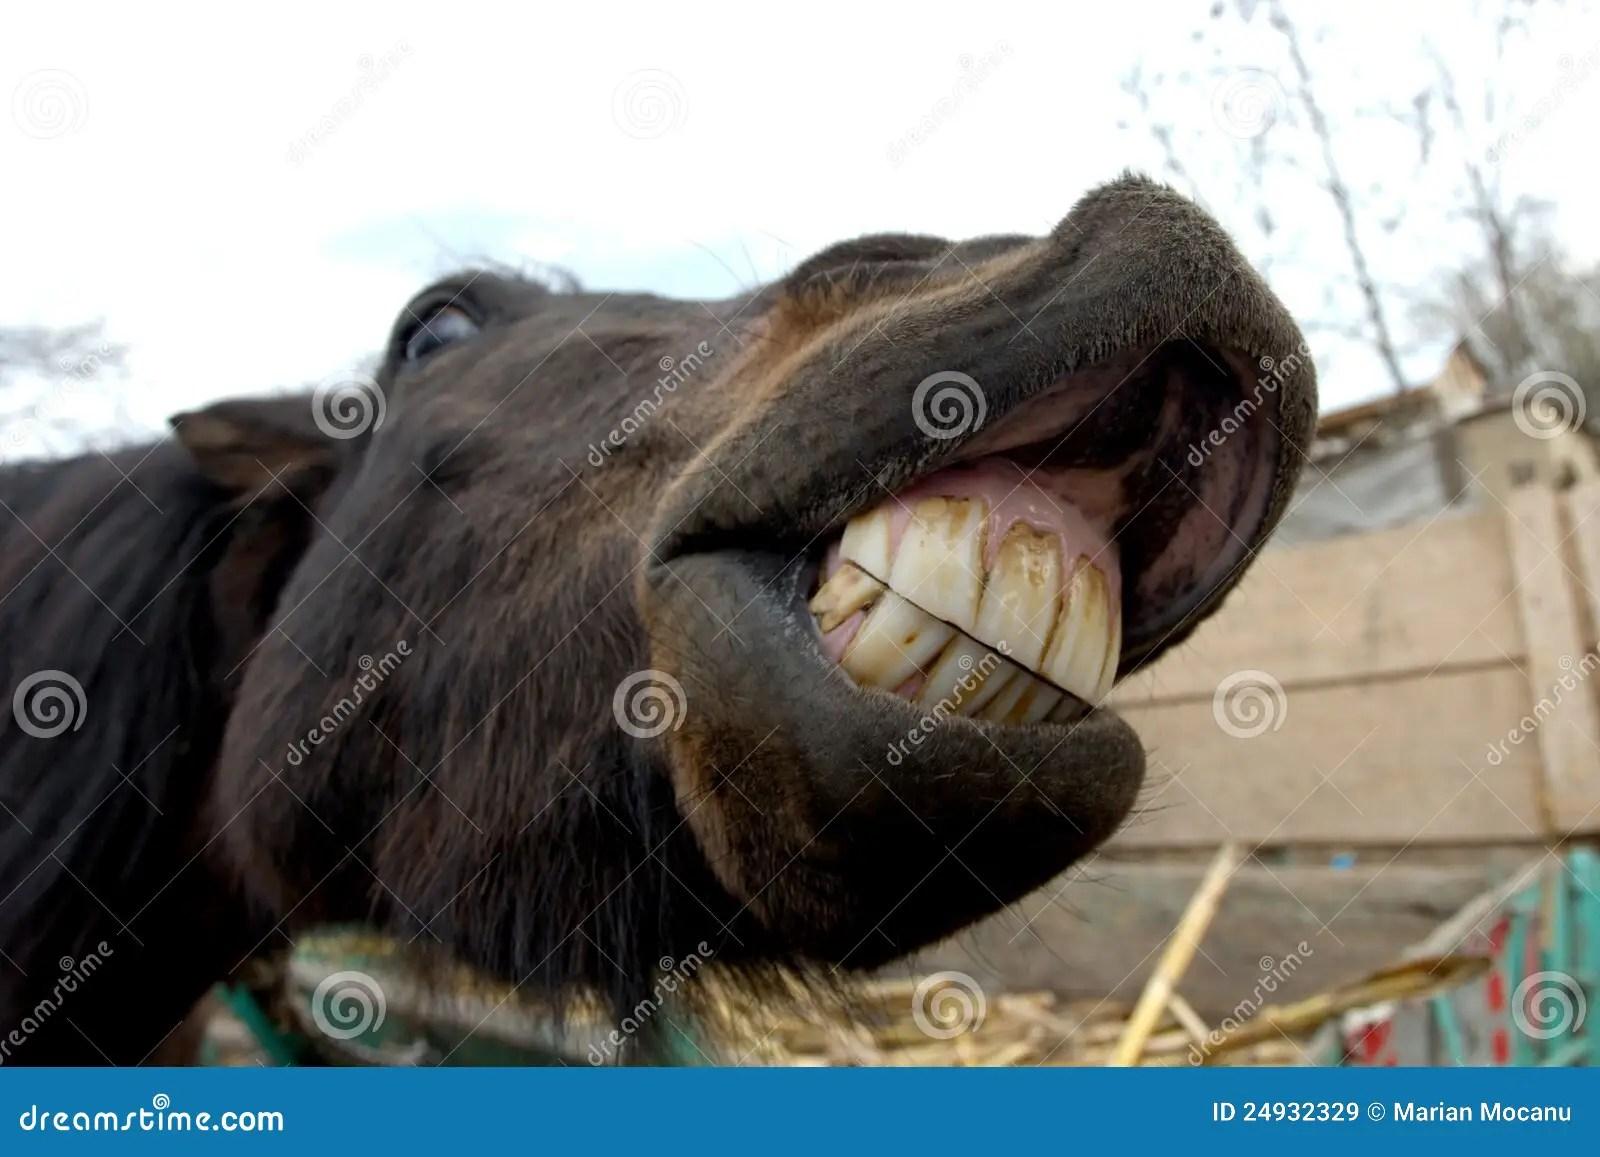 Animal Farm Wallpaper Horse Smile Stock Image Image Of Sneeze Farm Meadow